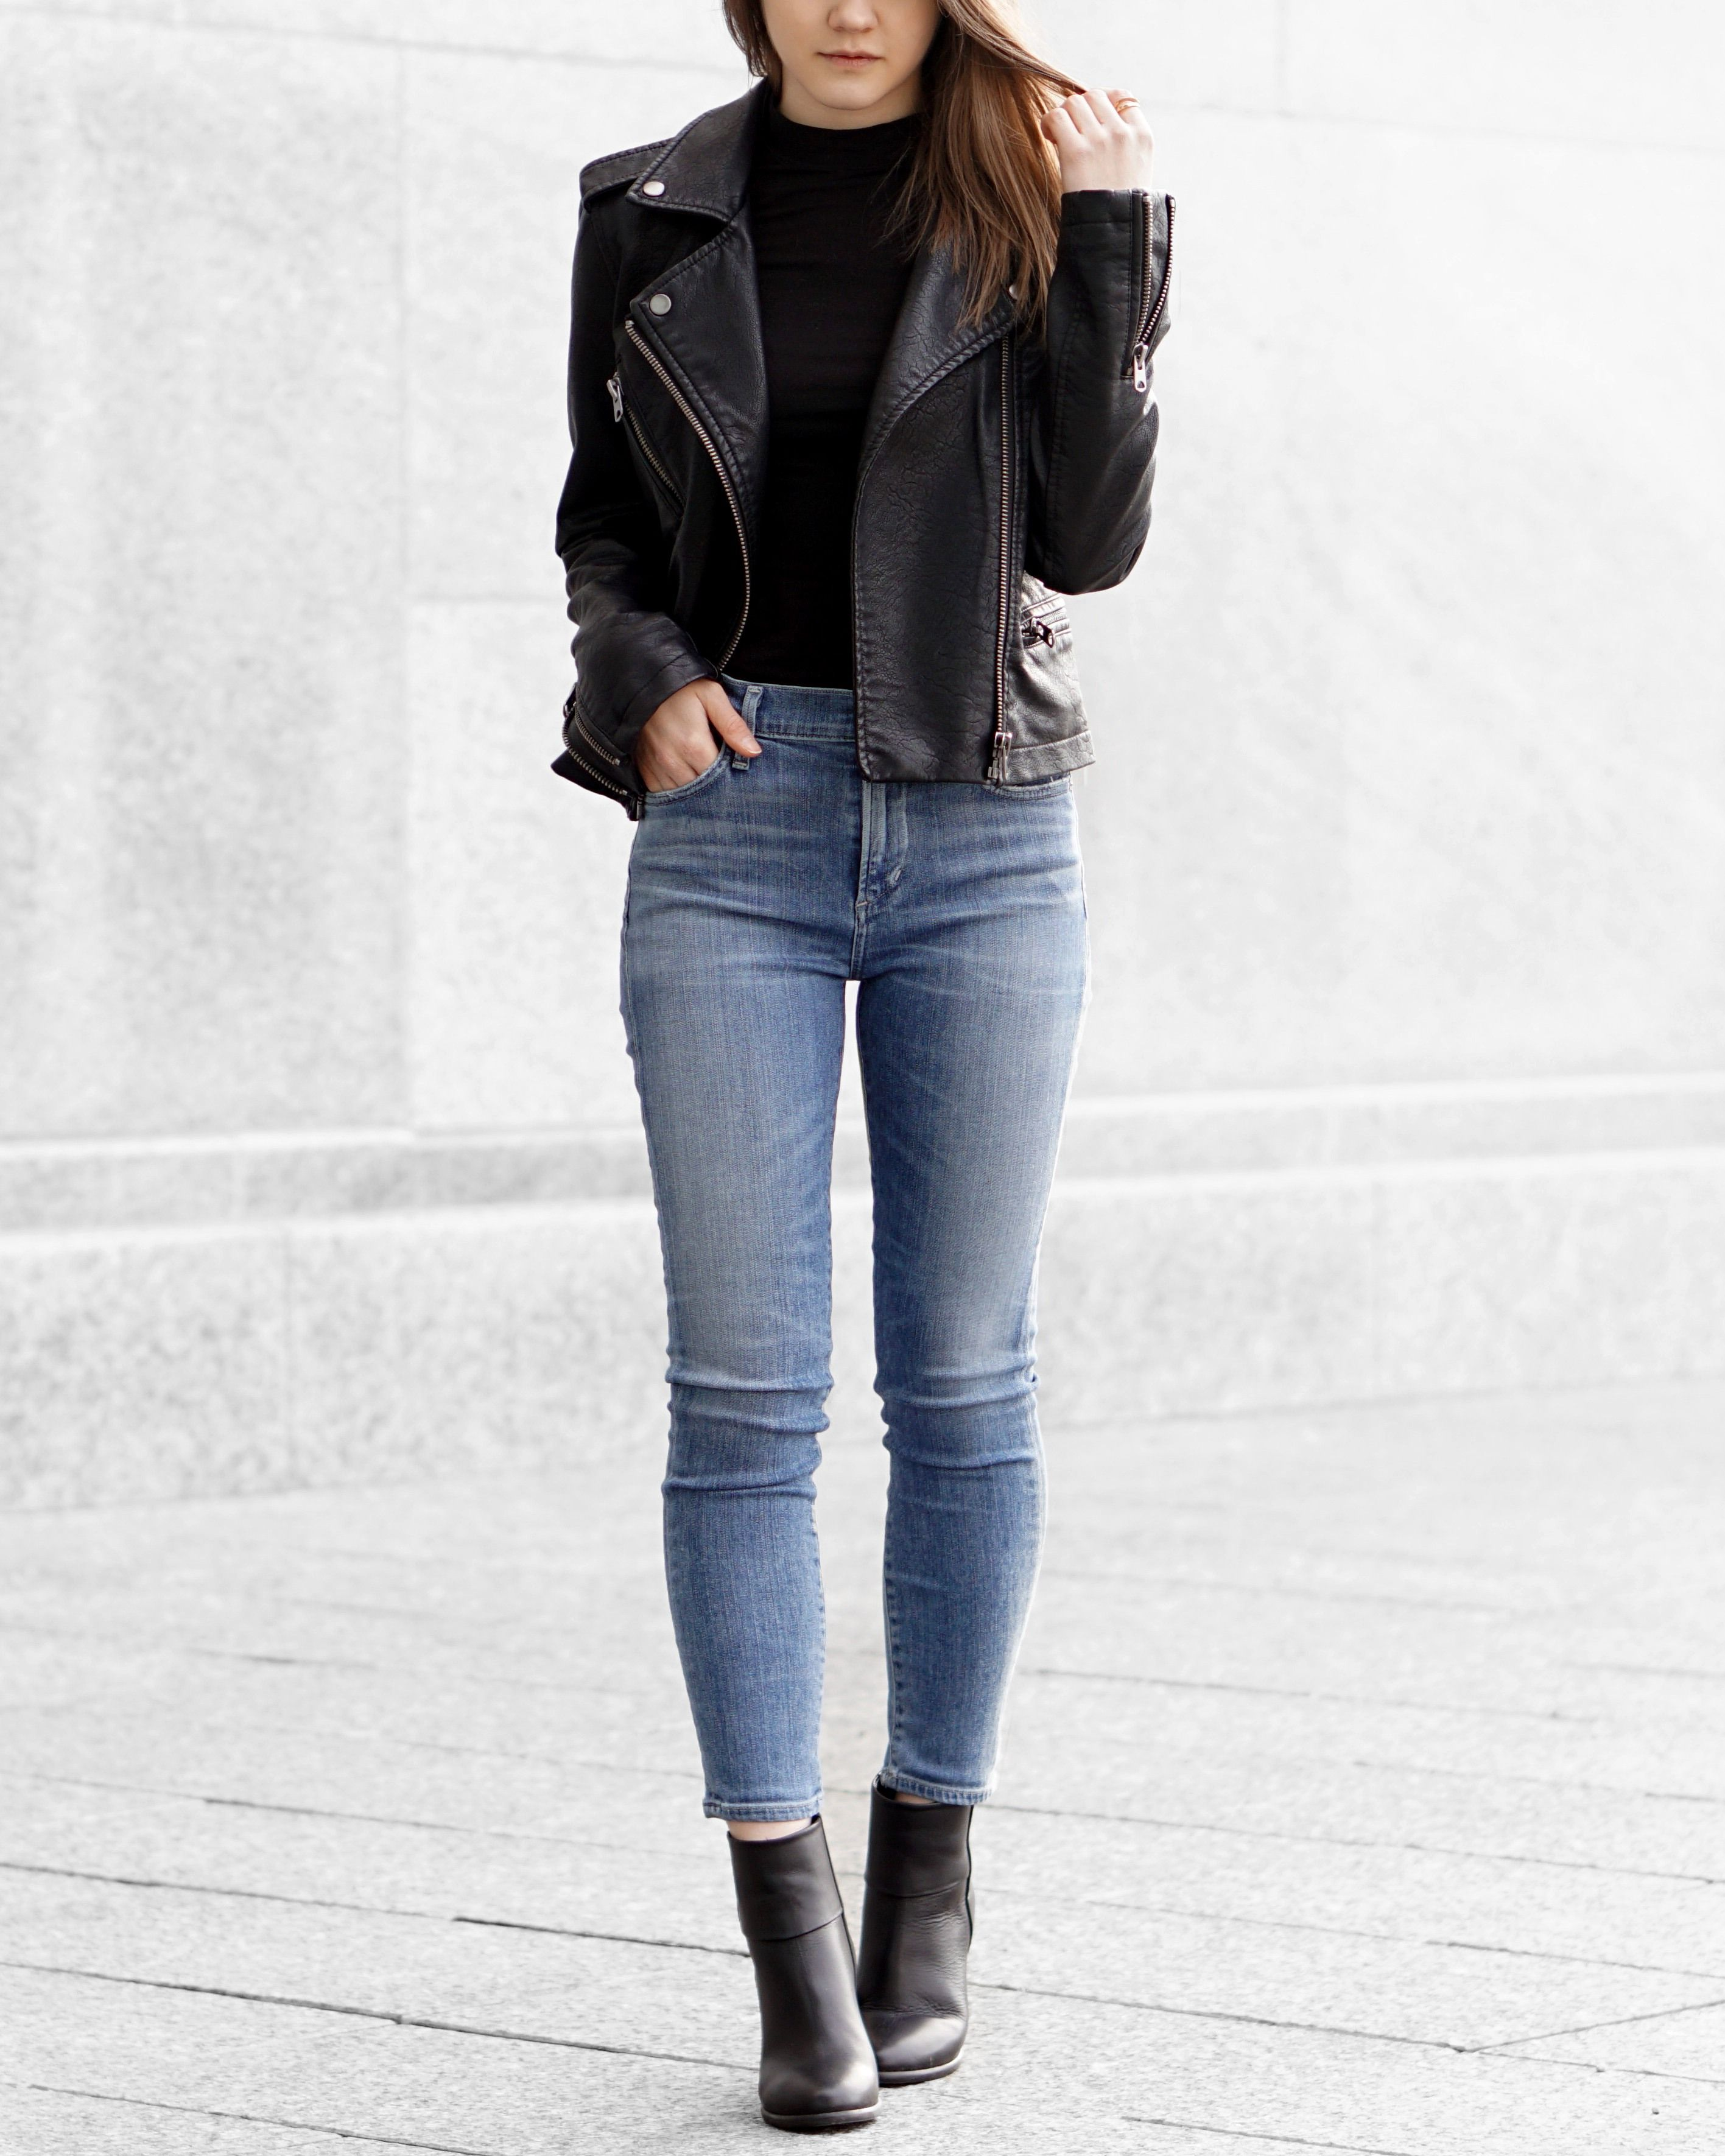 Leather Jacket Skinny Jeans Winter Outfits Pinterest Palomino Xaveri Totebag Grey A Little Detail Moto Black Turtleneck Ankle Boots Outfit Springfashion Fallfashion Fashion